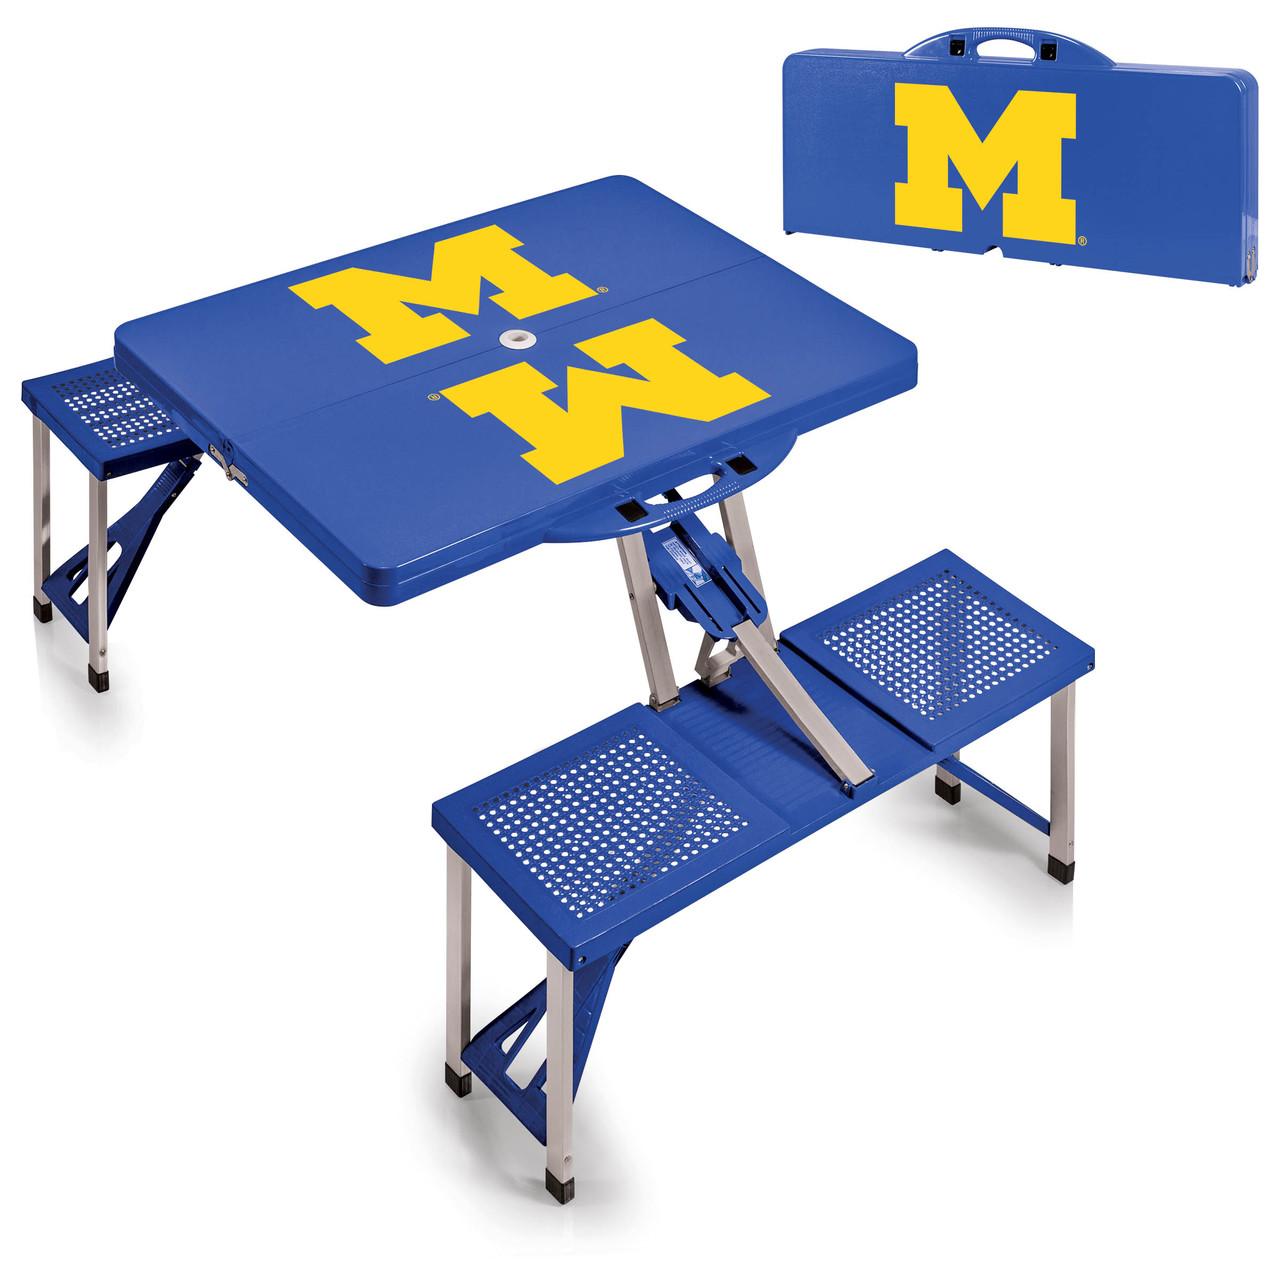 Picnic Table - University of Michigan